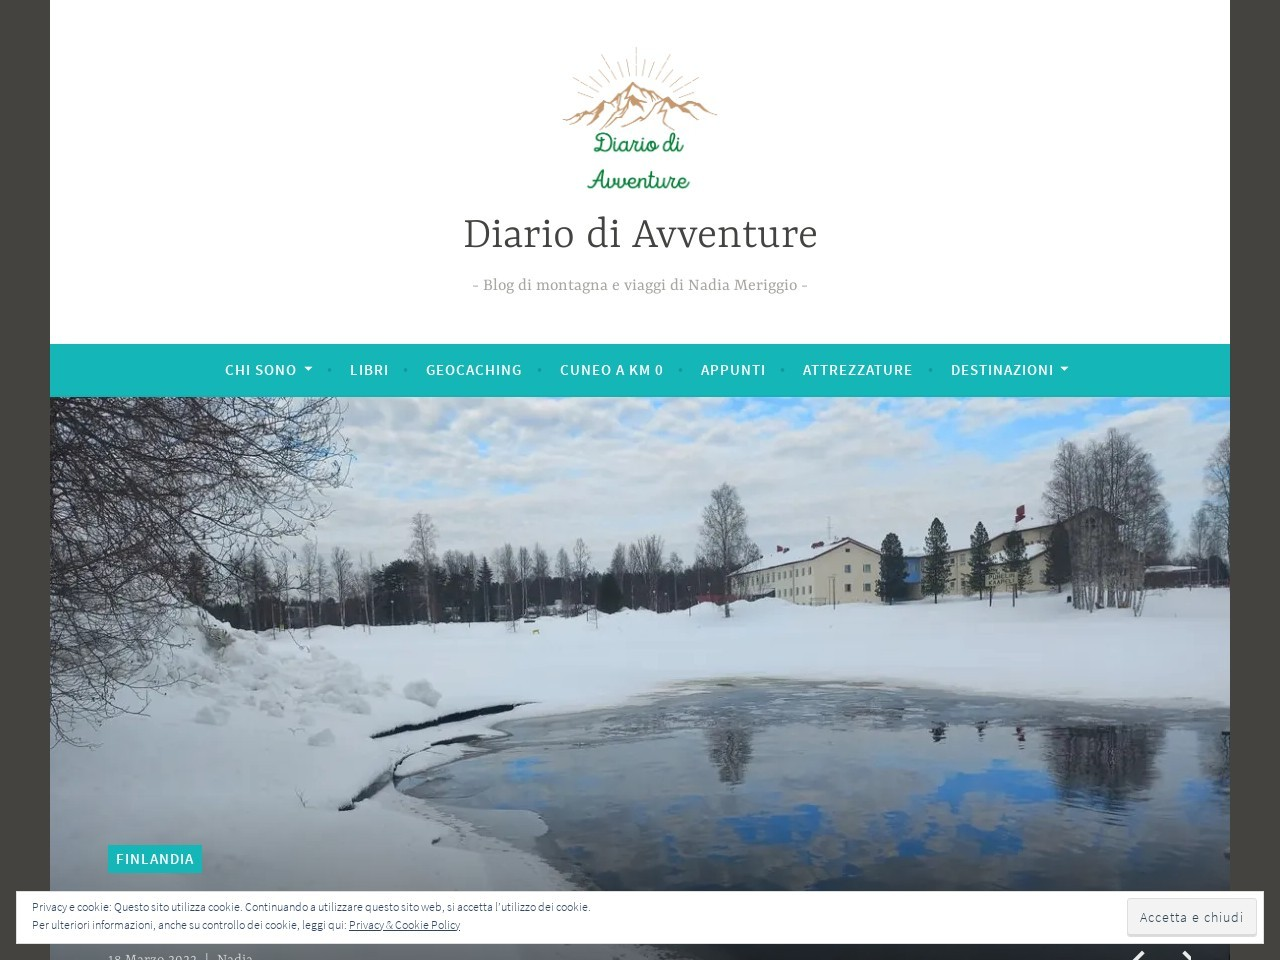 diario-di-avventure